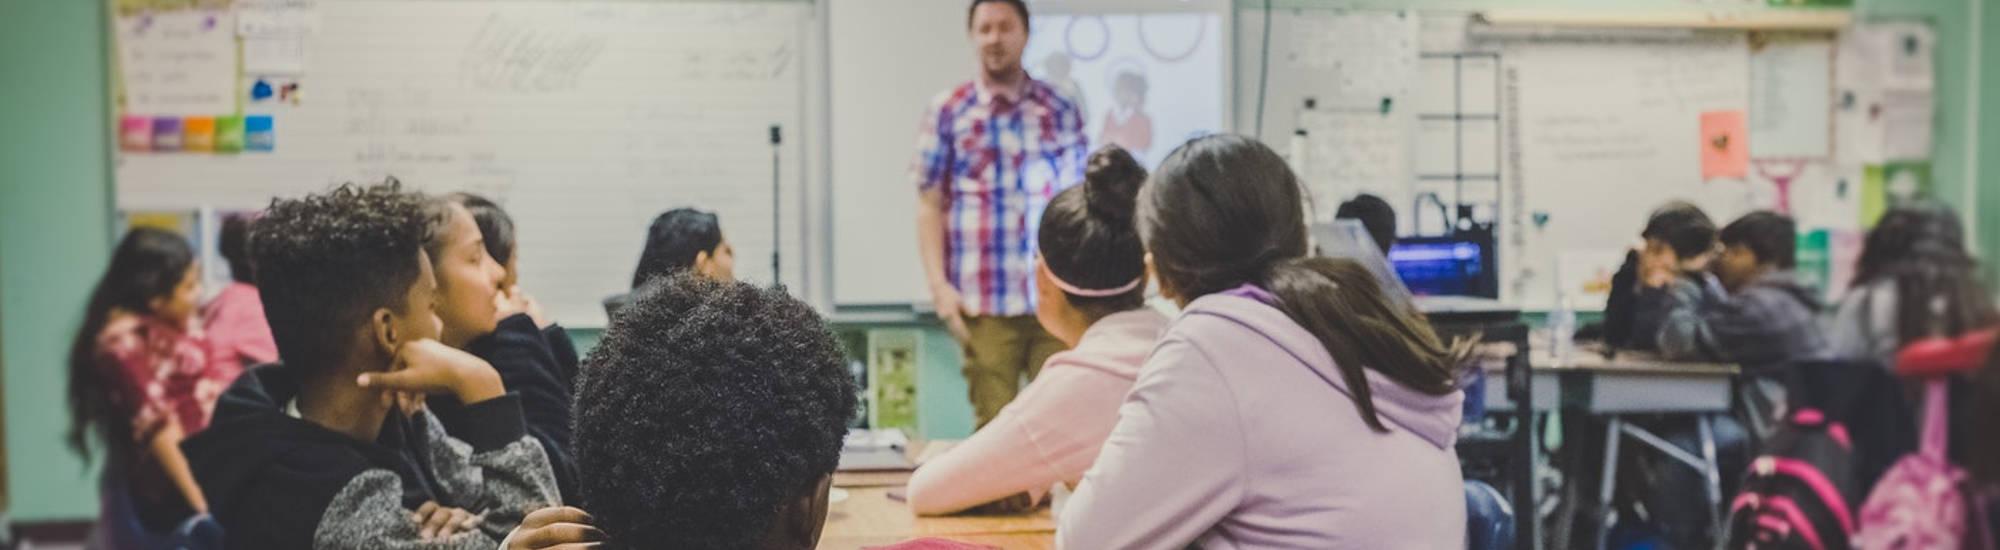 Educa Week 2018 acontece de 24 a 27 de setembro; Leandro Karnal ministra palestra no encontro